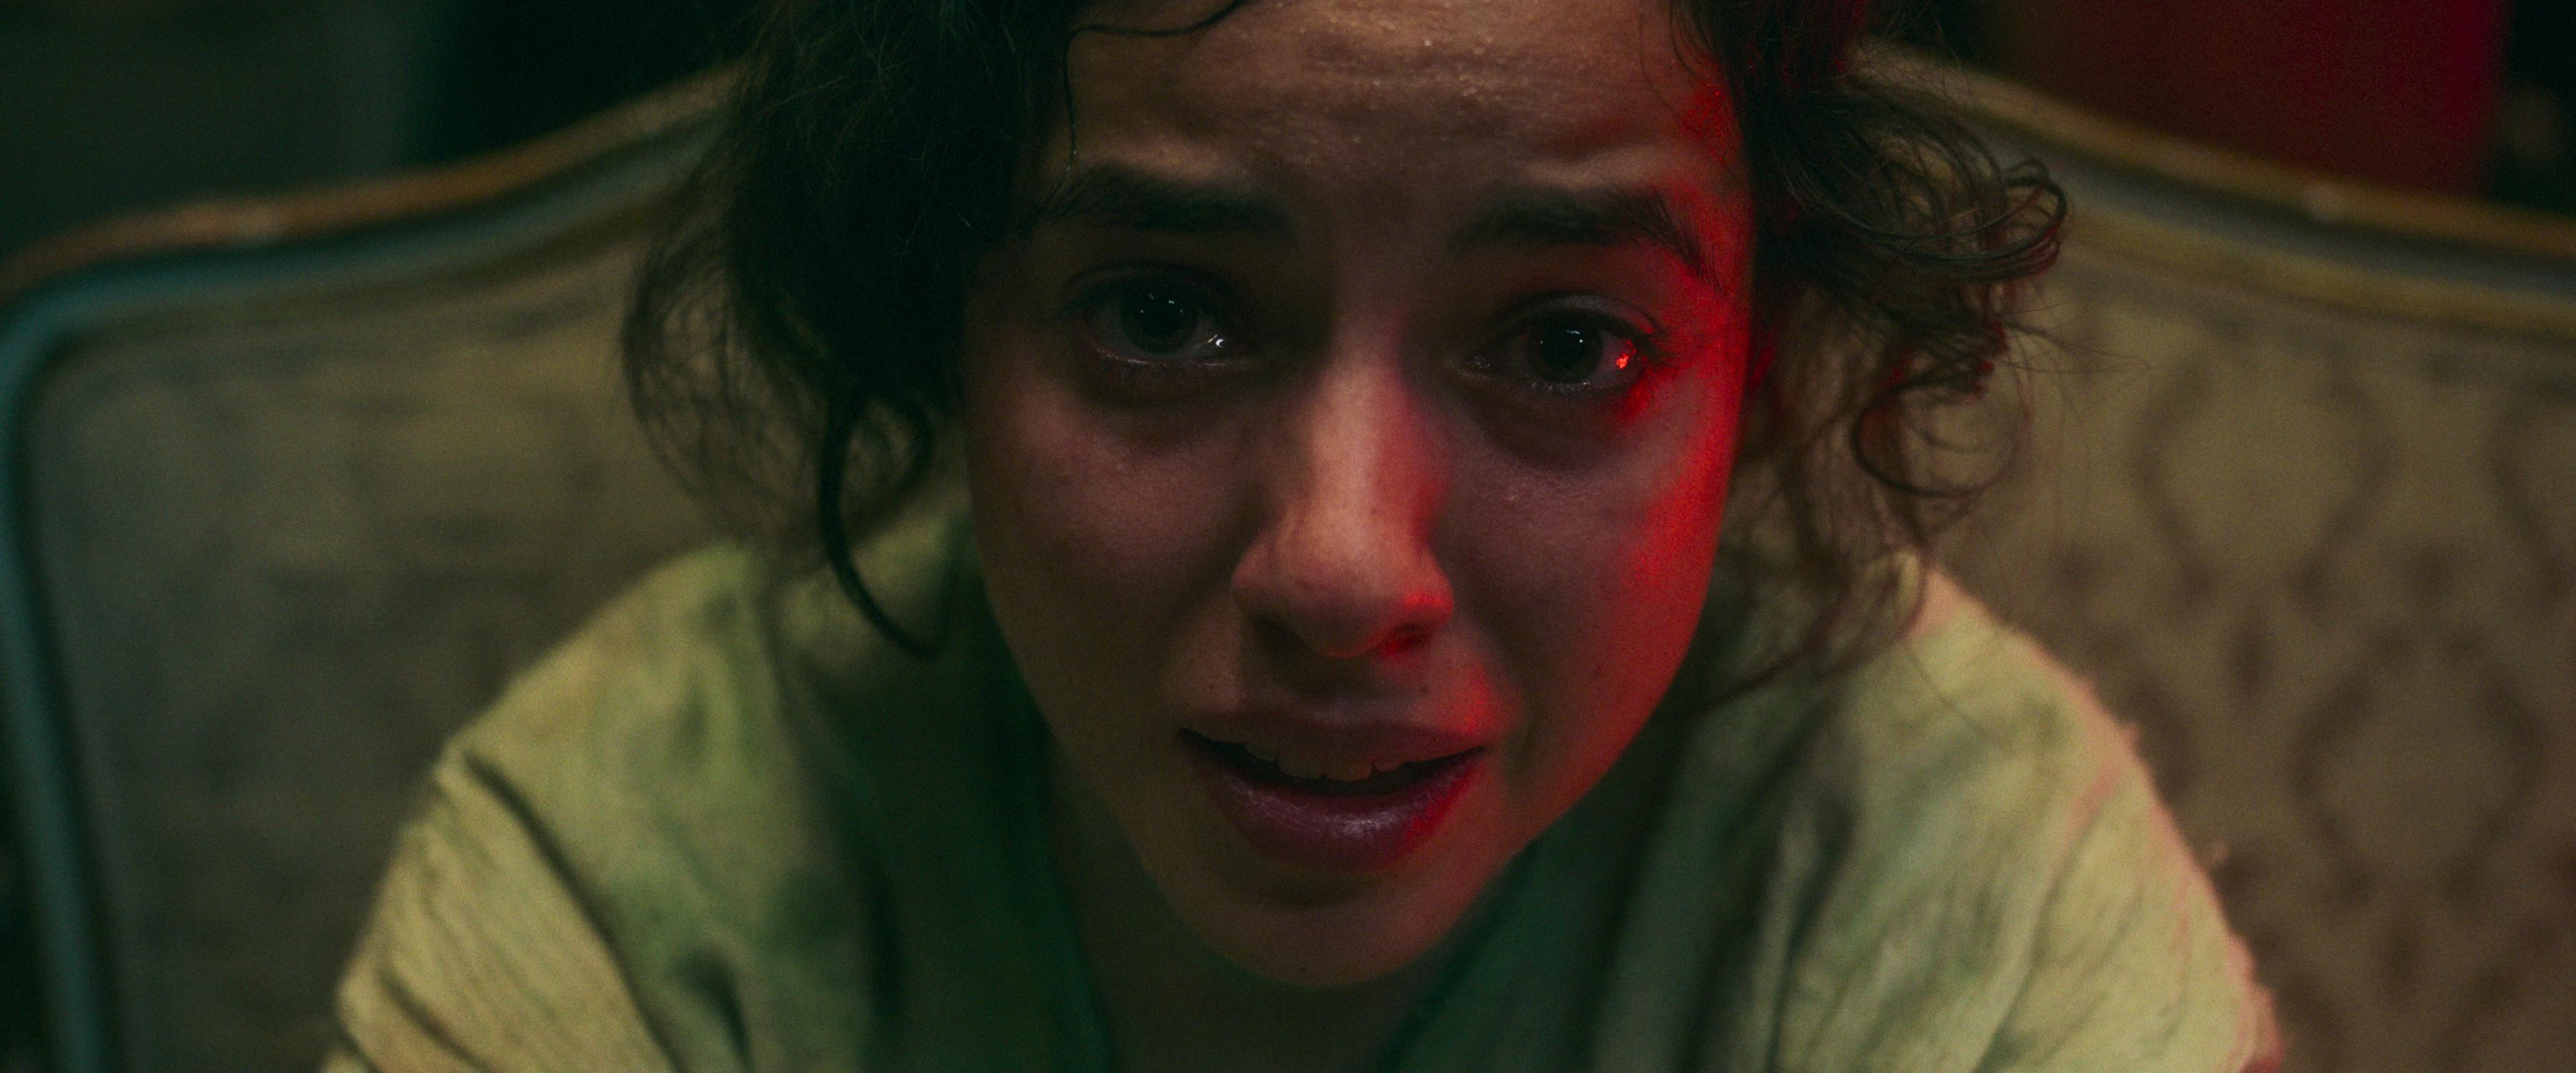 Cristina Rodlo as Ambar, in closeup, weeping and frightened